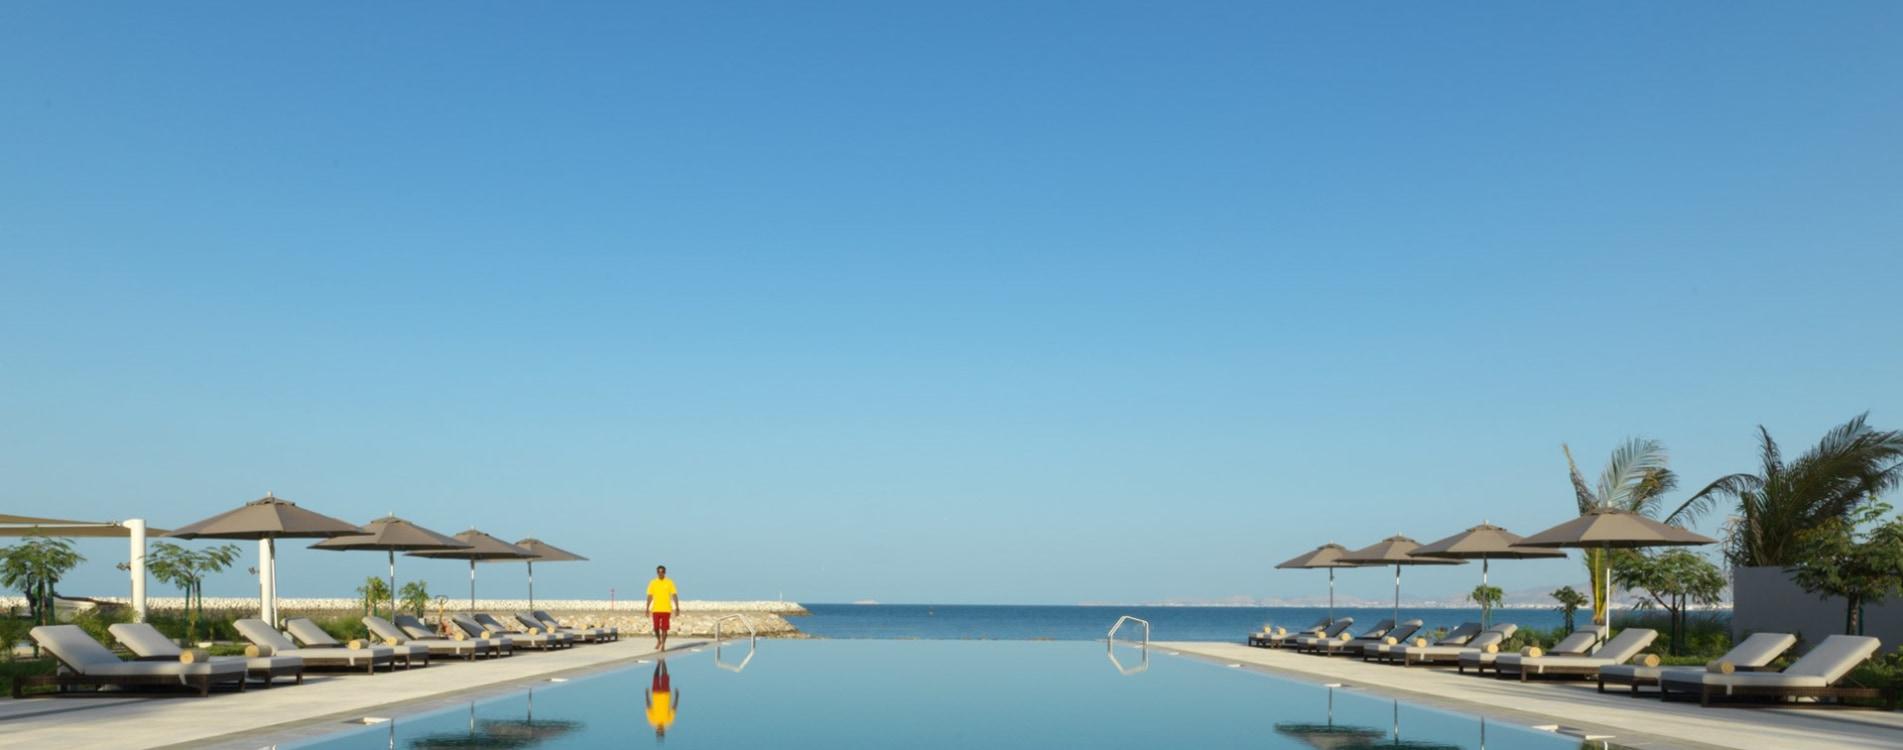 Kempinski-Hotel-Muscat-Grand-Hauptpool-Interior-Oman